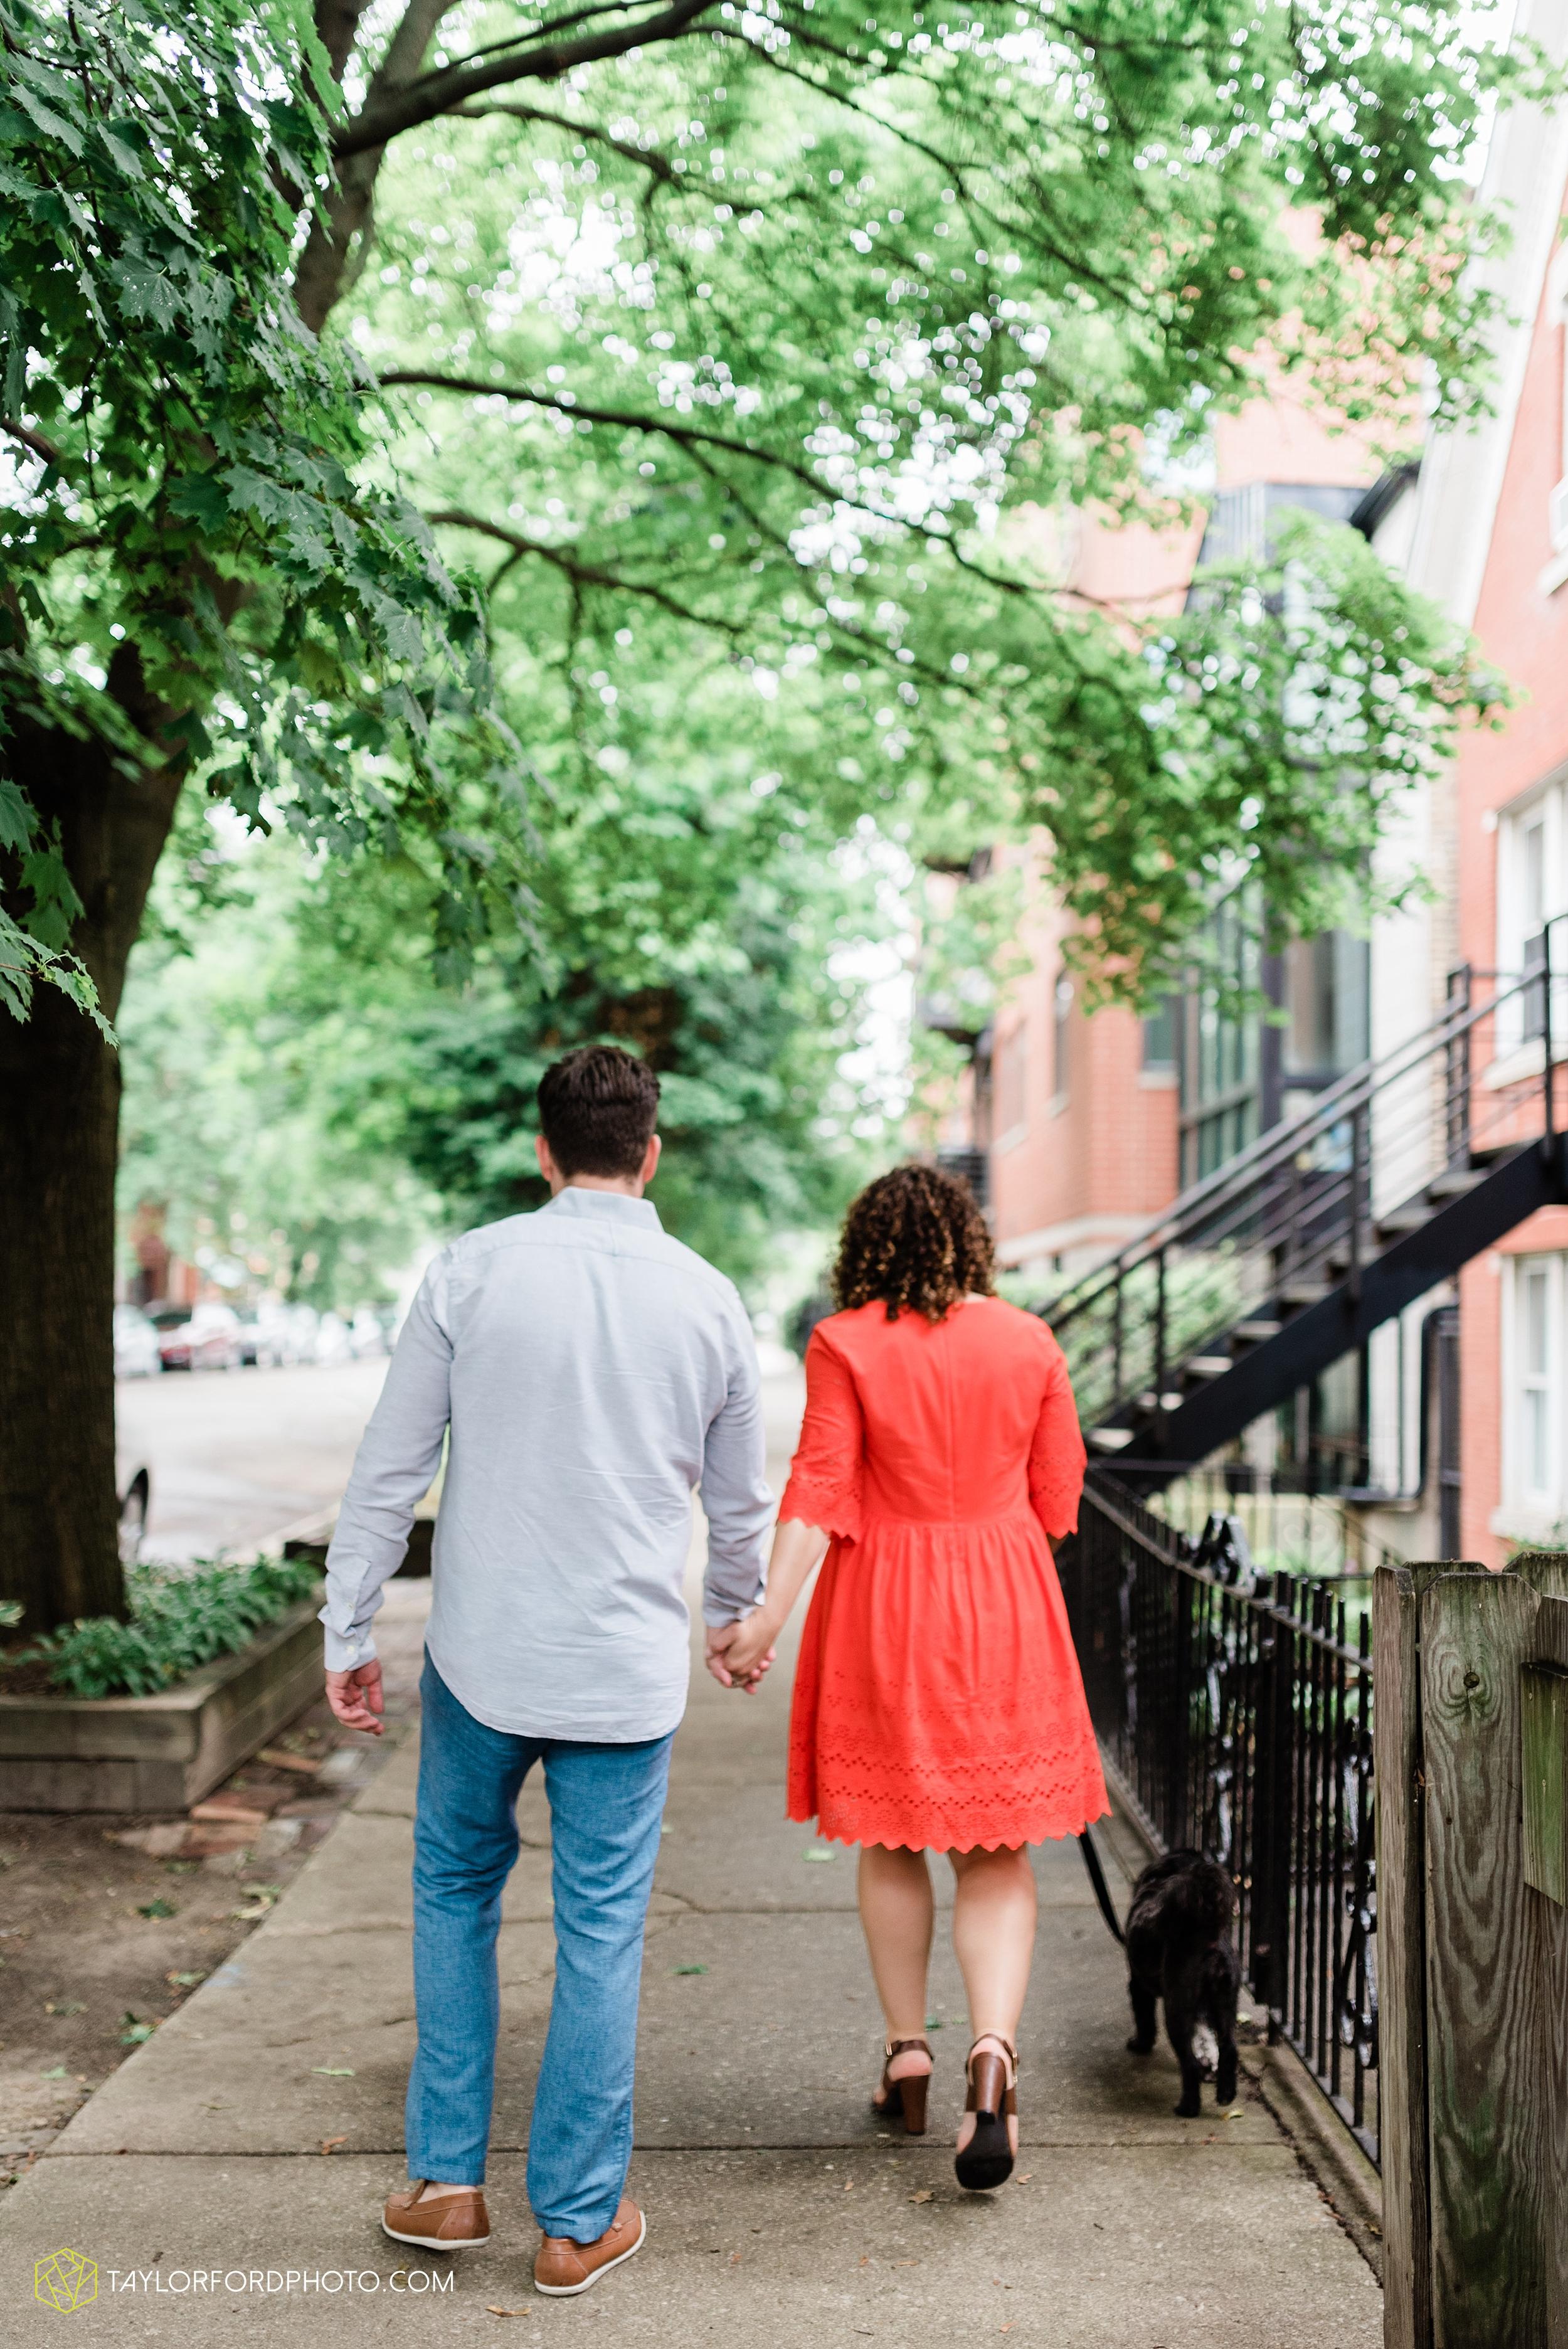 chicago-illinois-ipsento-606-high-line-wicker-park-bucktown-prosecutor-engagement-wedding-photographer-Taylor-Ford-Photography_8713.jpg